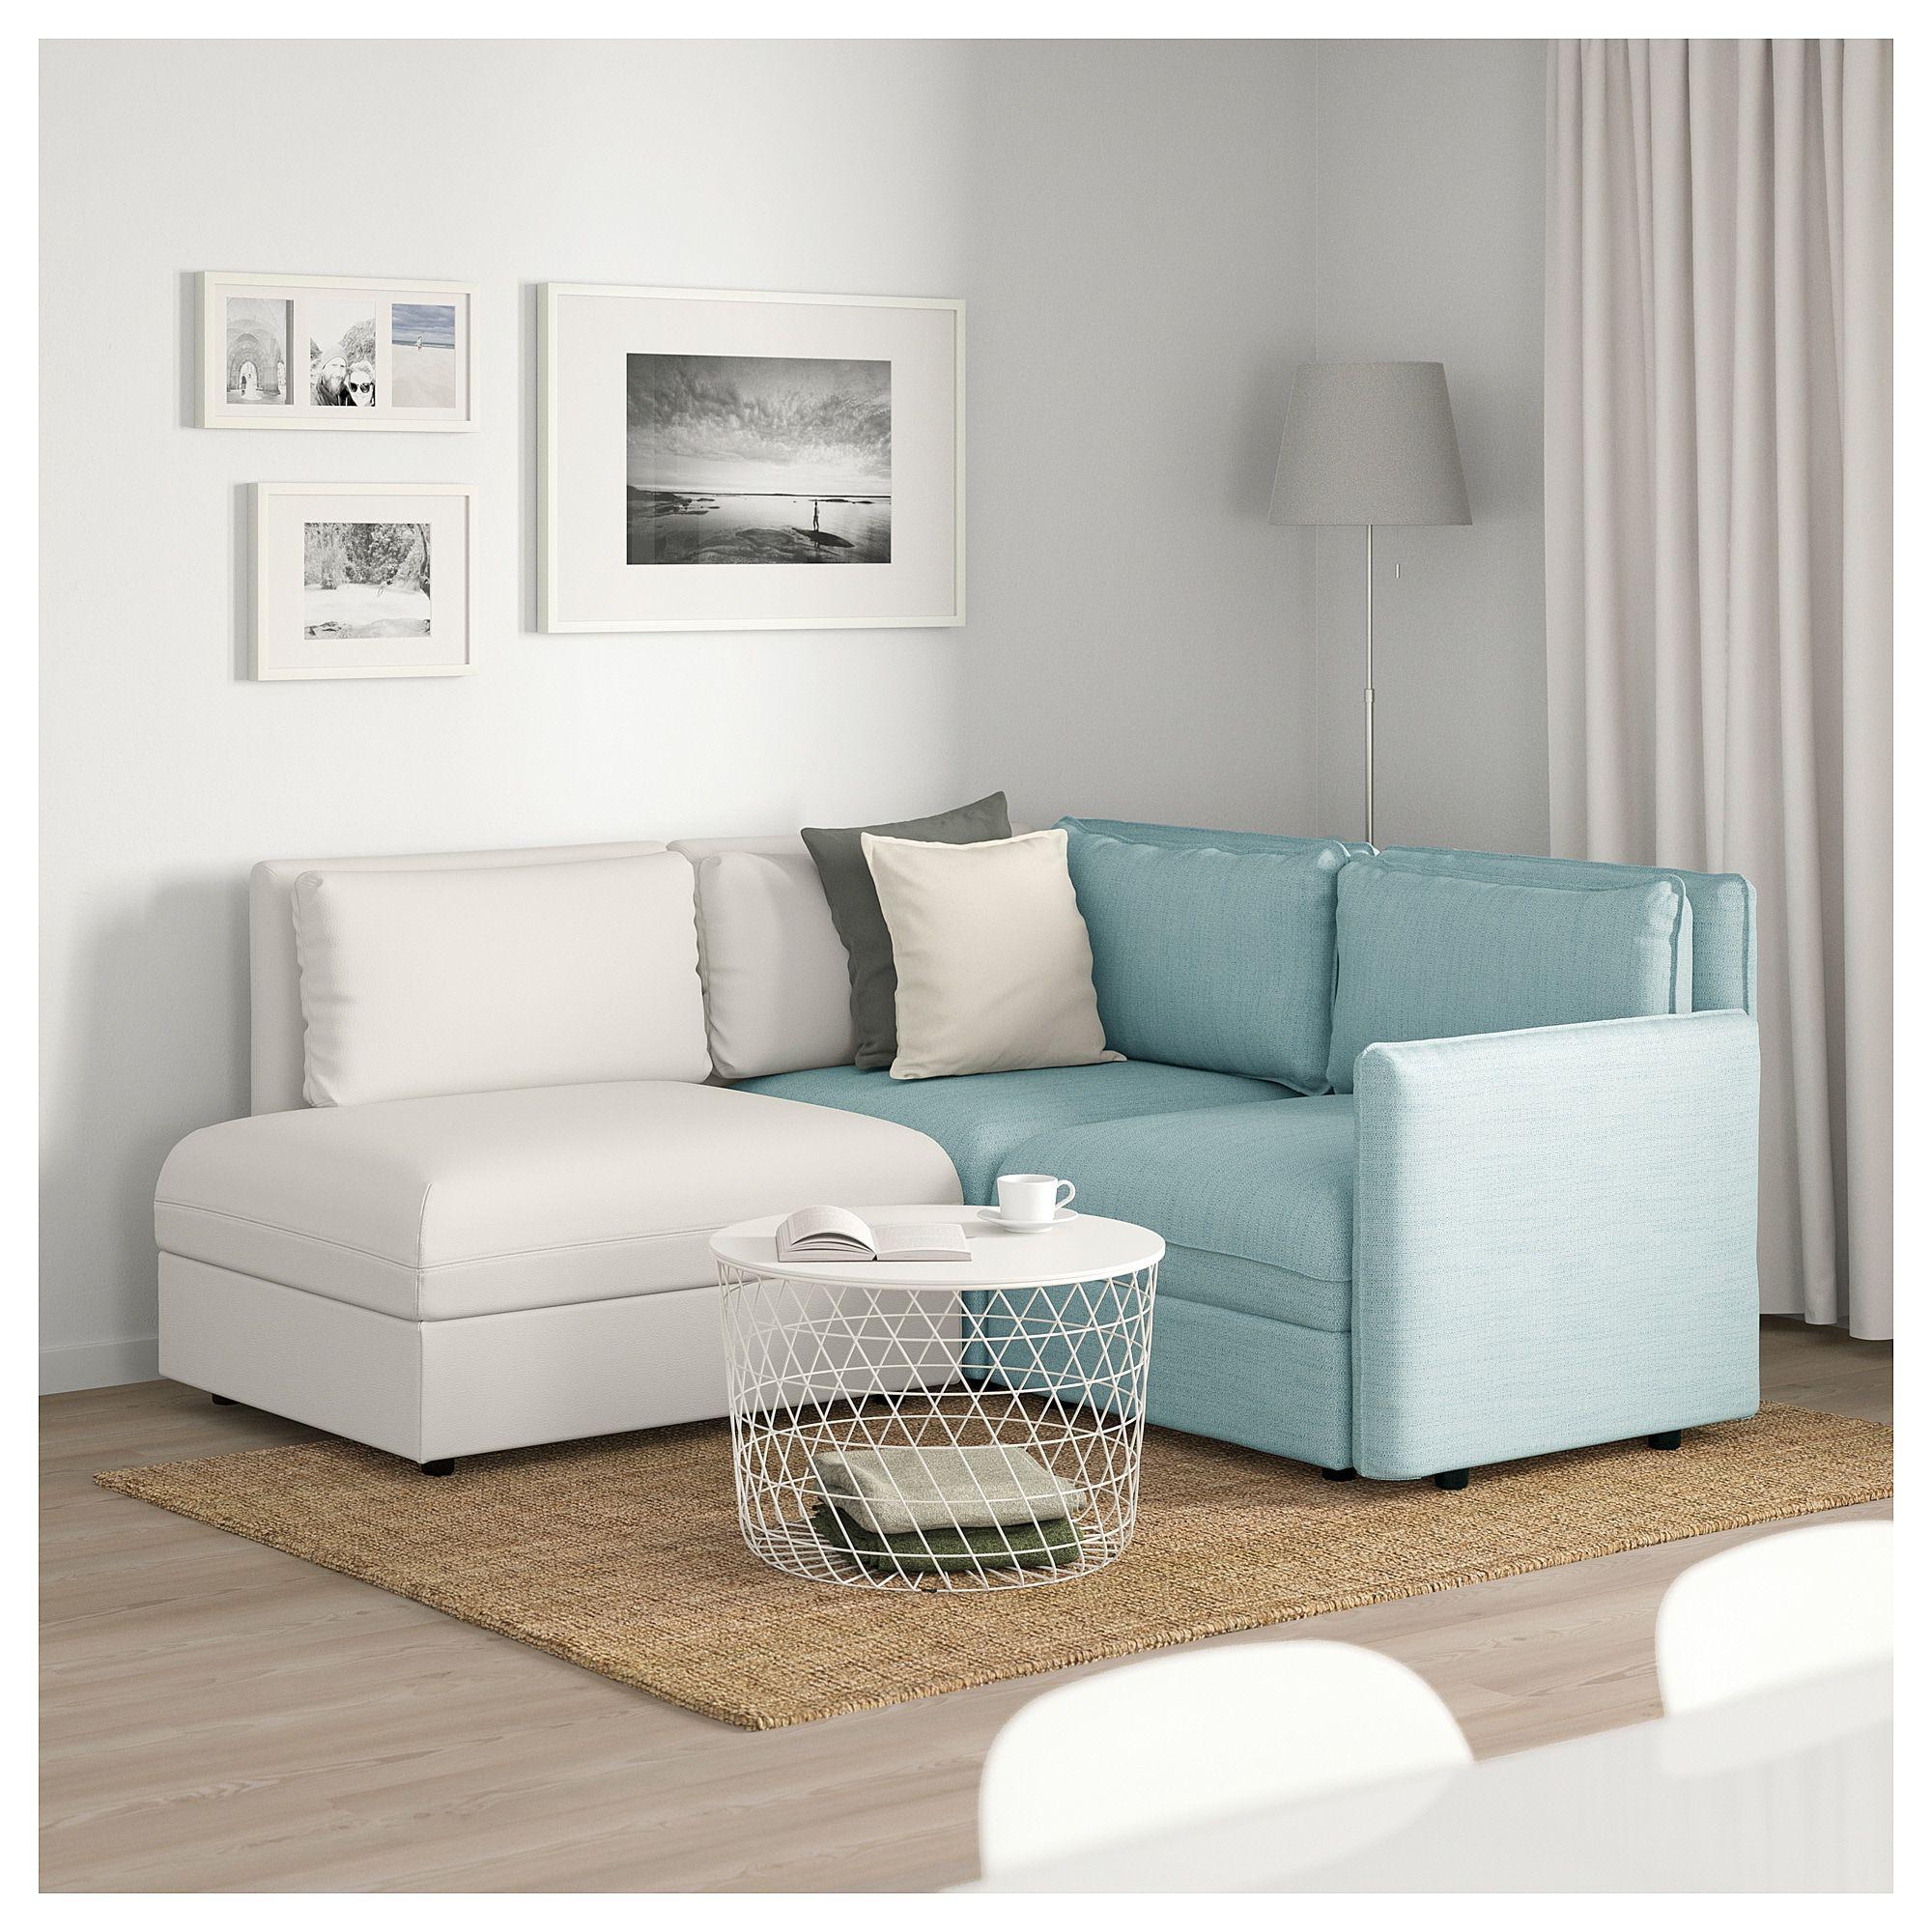 Sofas Modulares Ikea J7do Vallentuna Sectional 3 Seat with Storage Hillared Murum